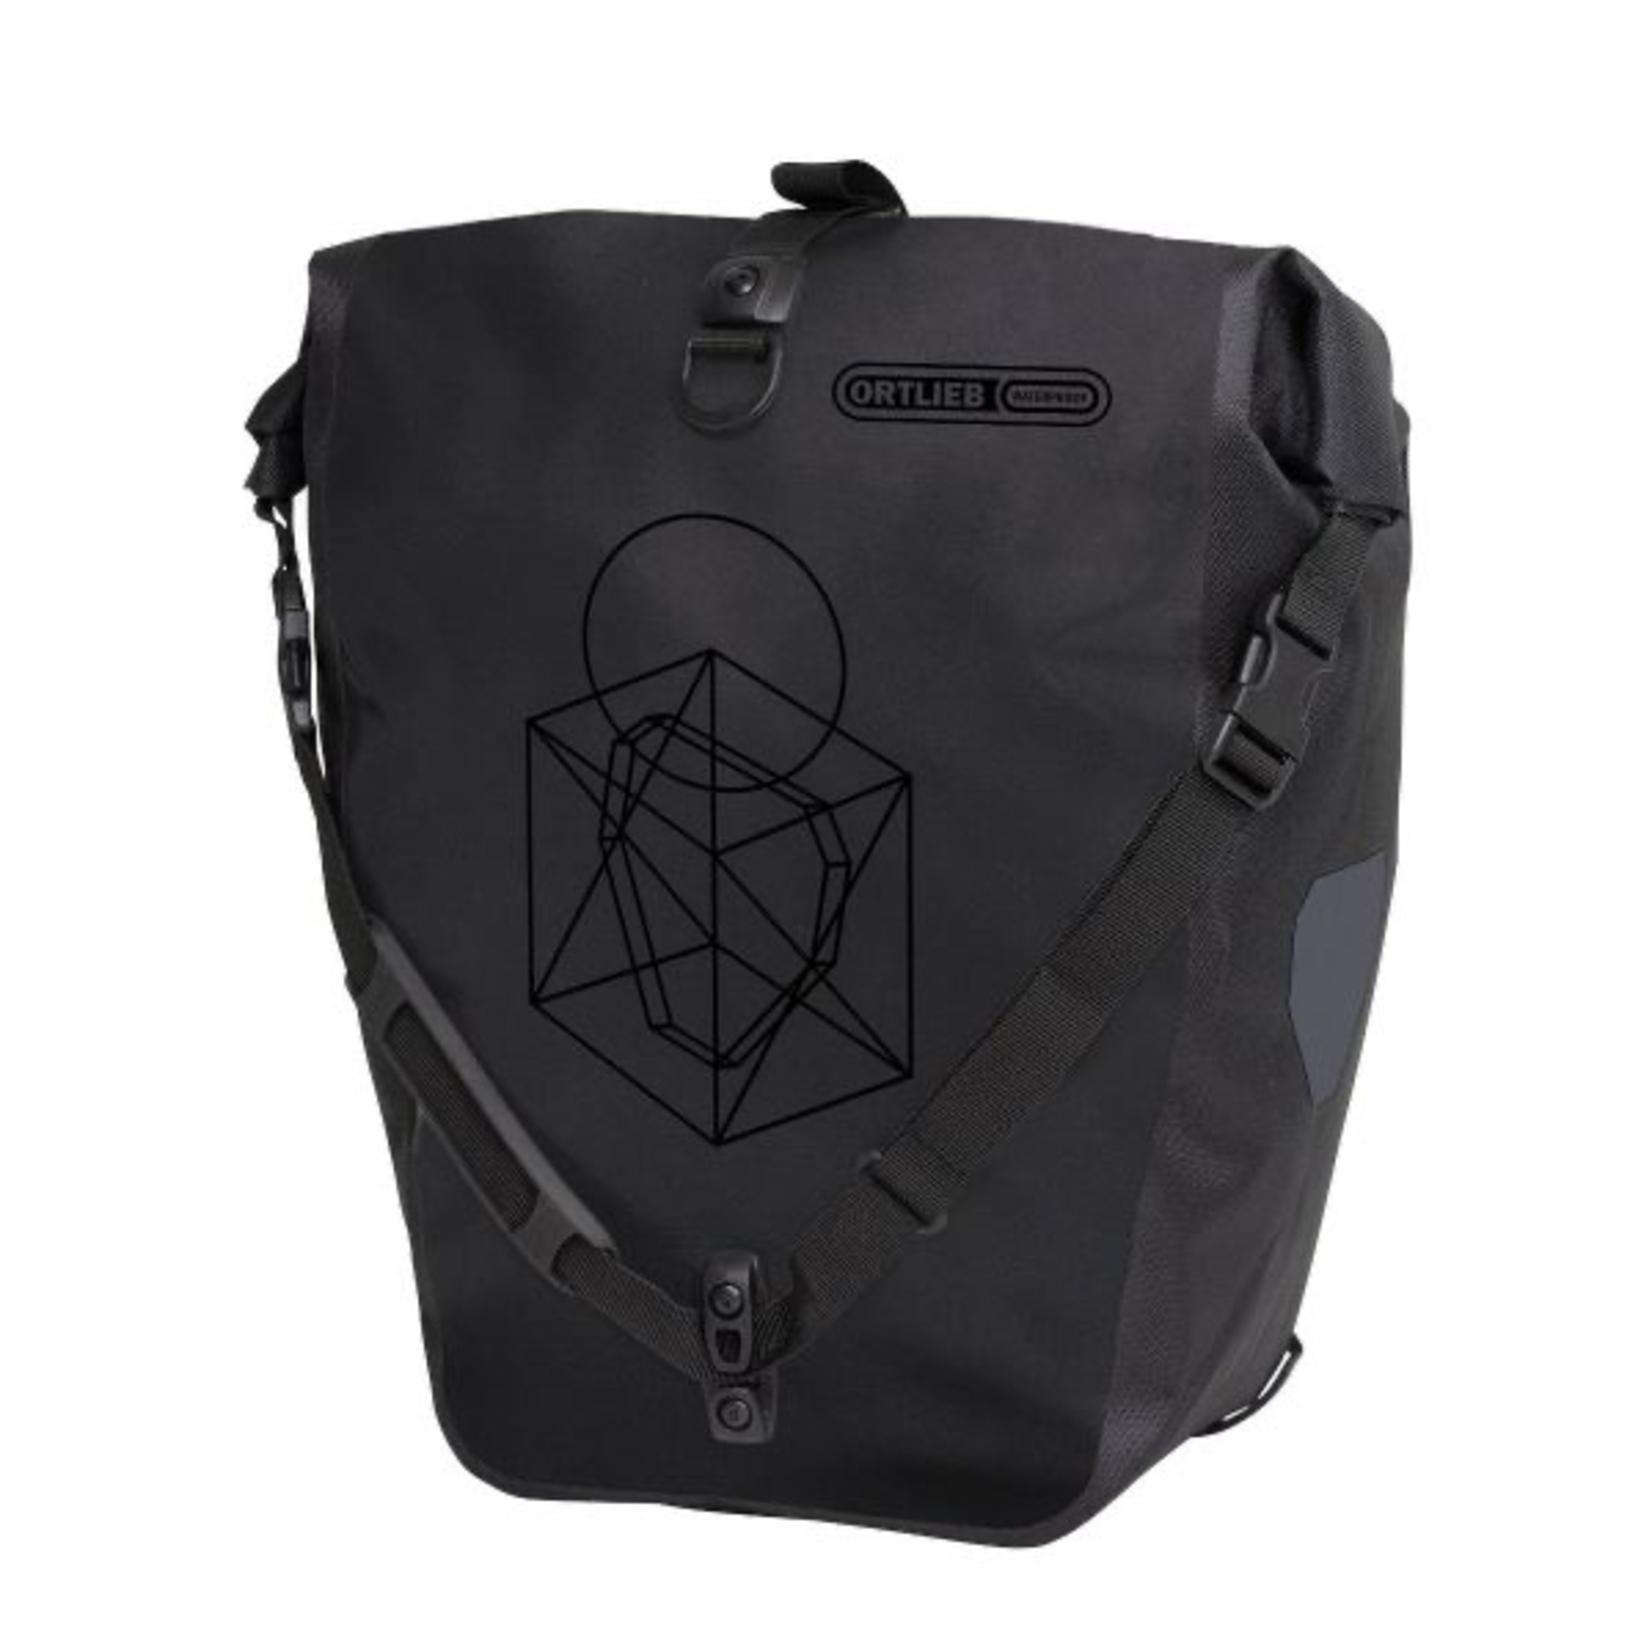 ORTLIEB ORTLIEB - Tasche Back-Roller Design Symmetry QL2.1 20L - black